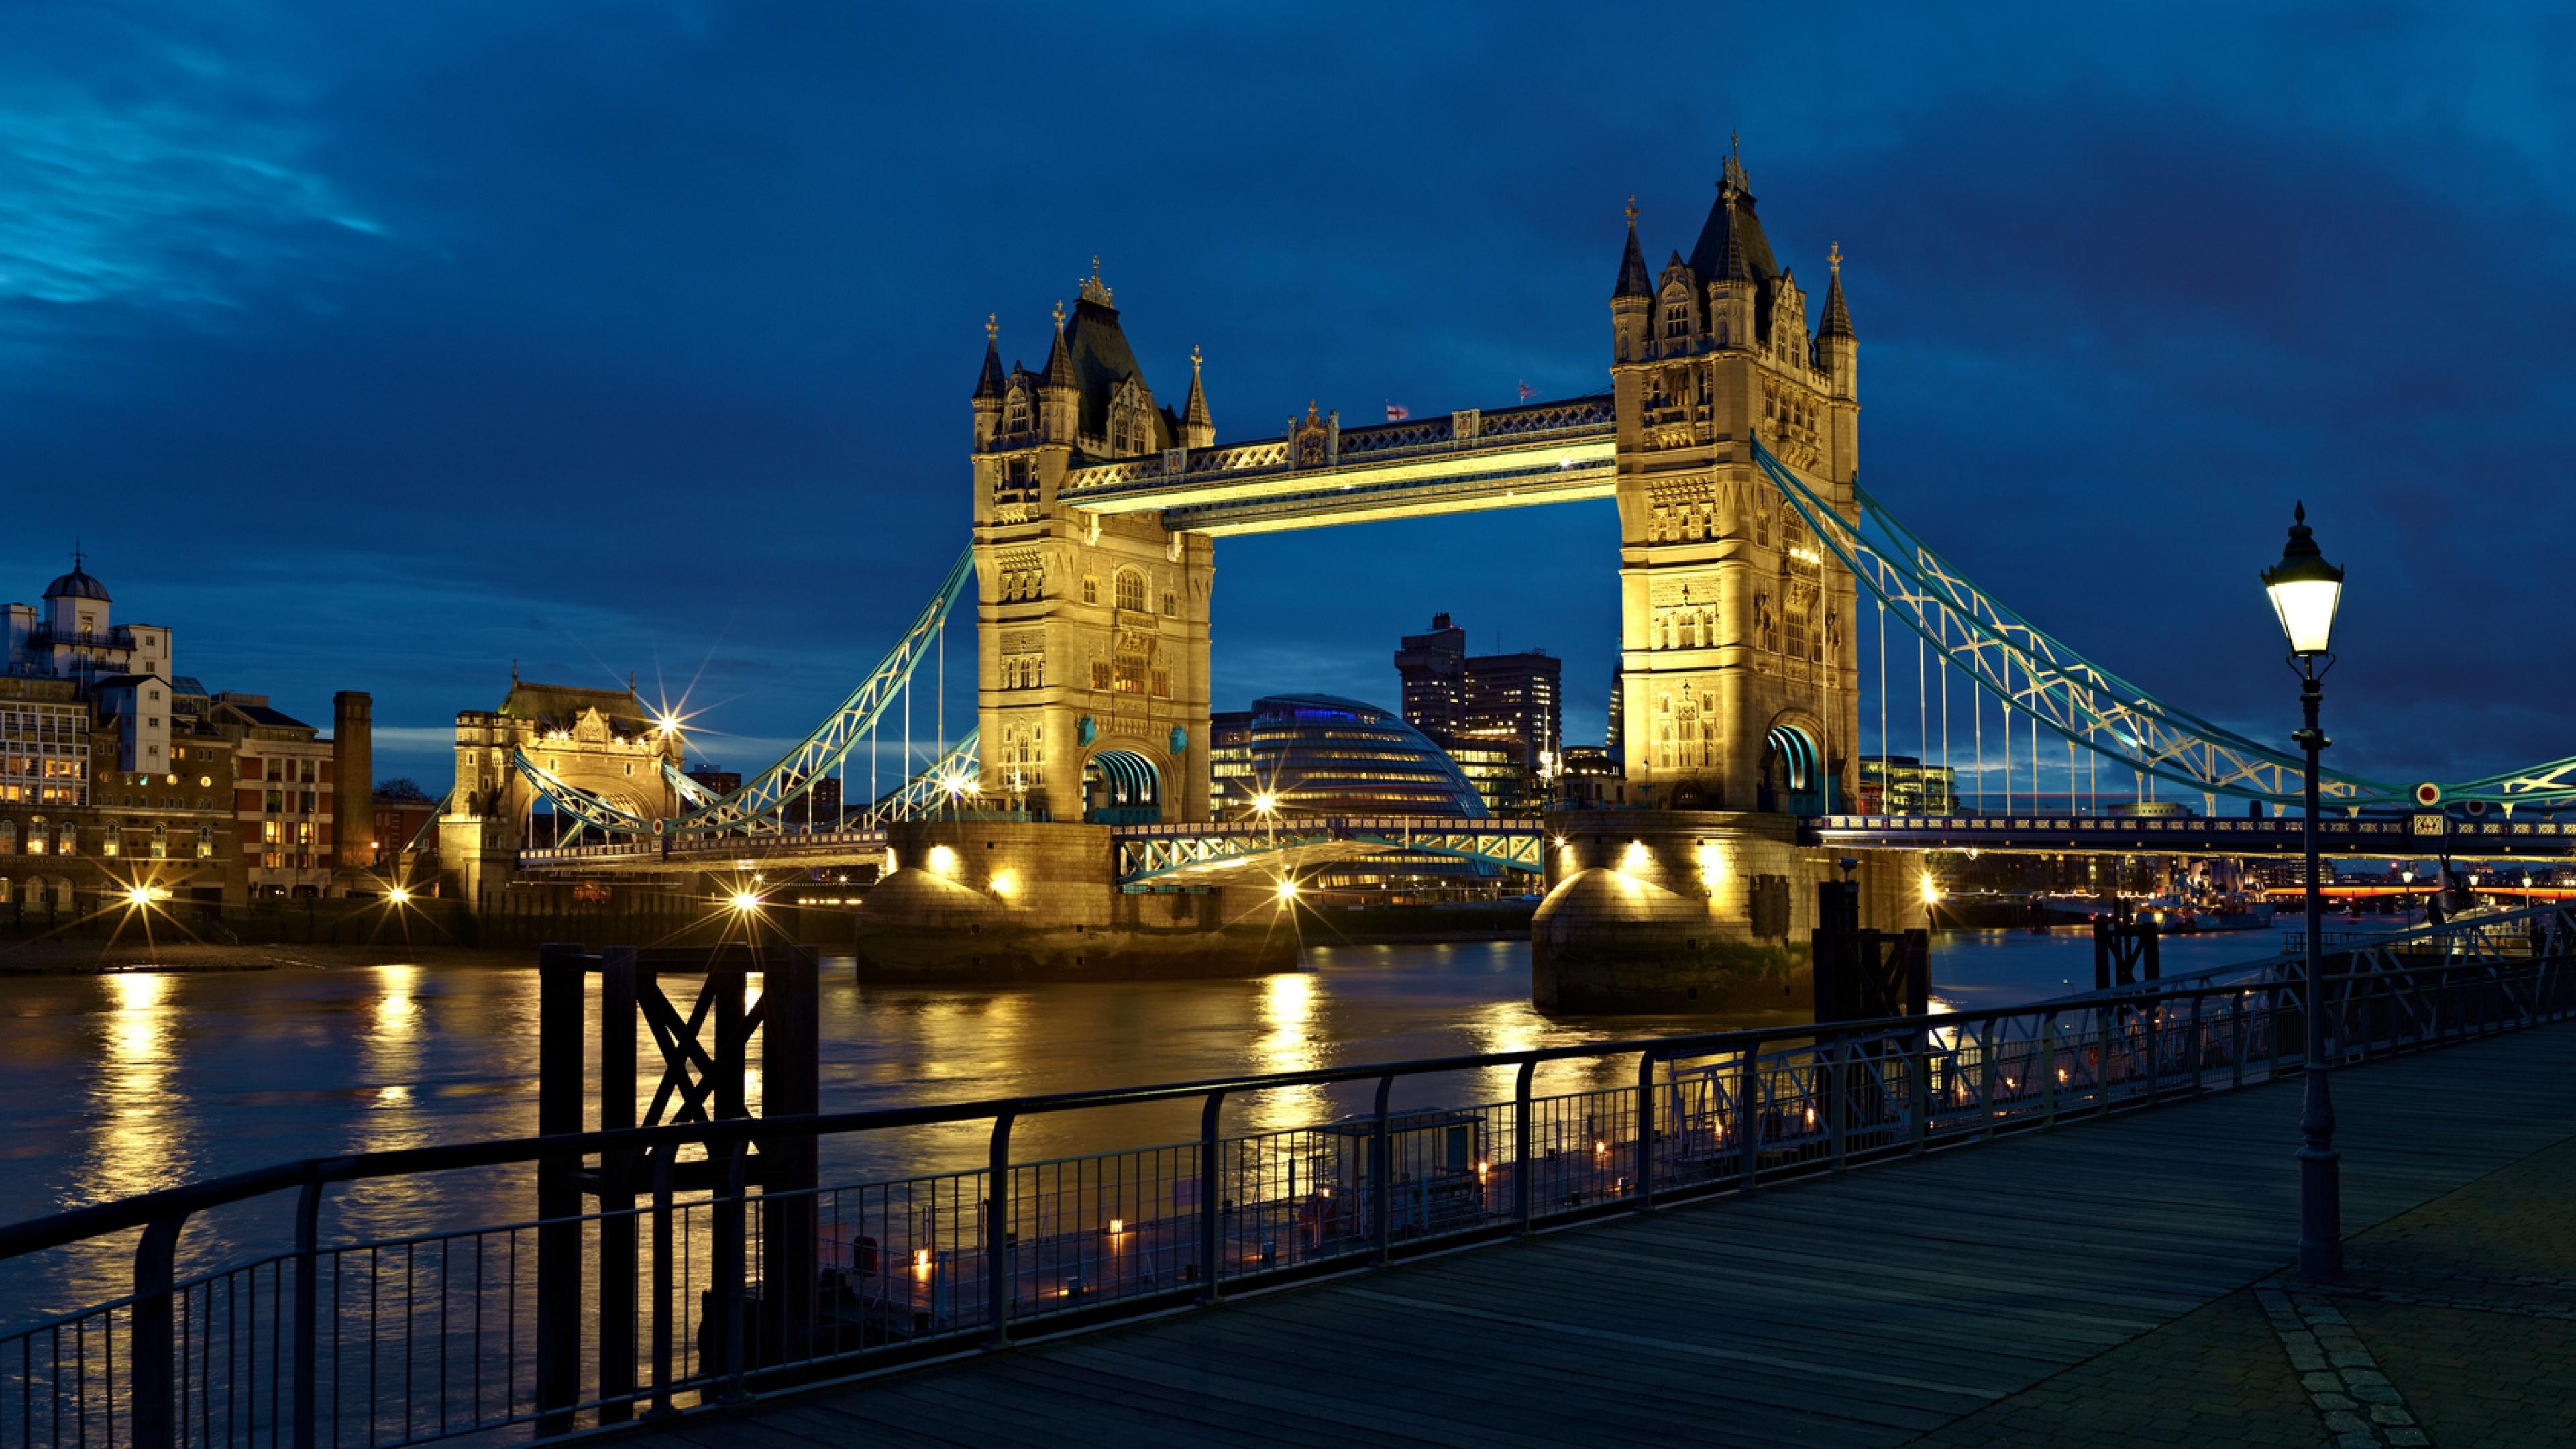 Thames Uk Tower bridge Lantern Wallpaper Background 4K Ultra HD 3840x2160